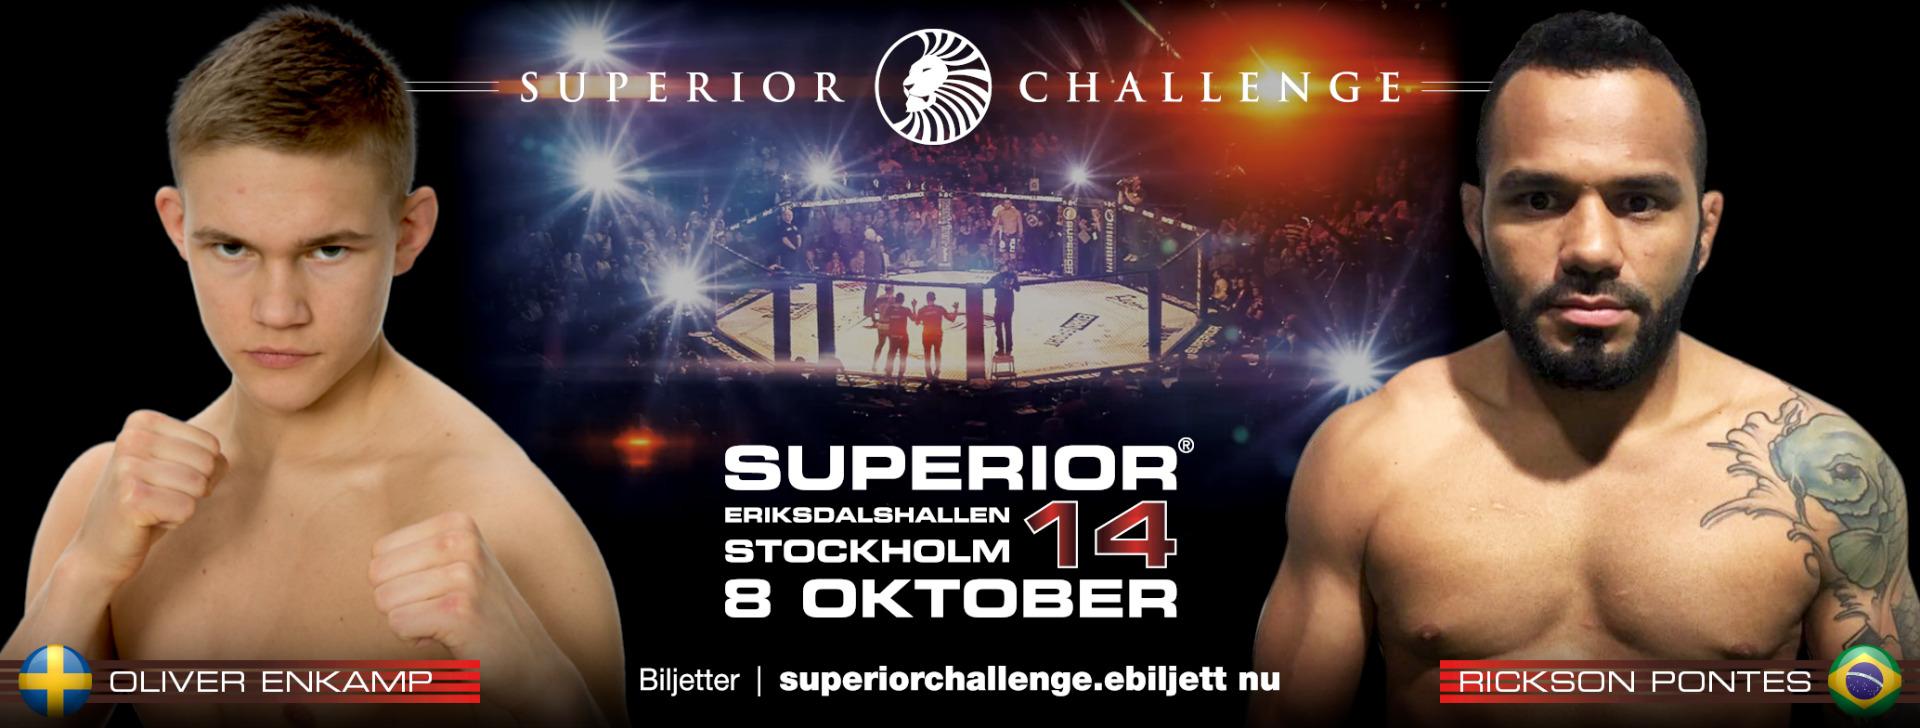 bout-presentation-superior-challenge-14-facebook-header-1034x392px-1068x784px-oliver-enkamp-vs-rickson-pontes